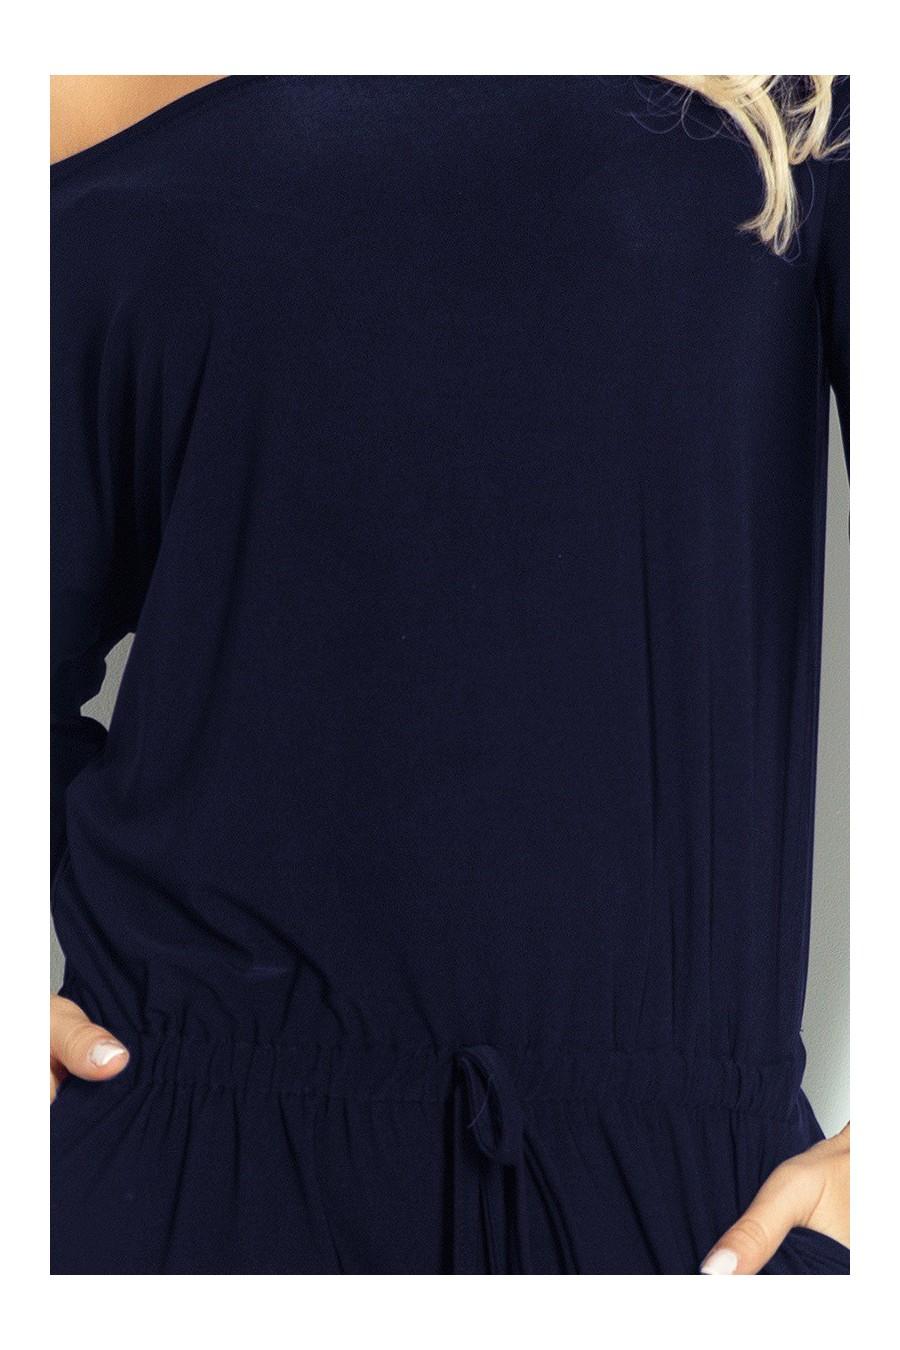 Oblek sporty - ity tmave modrý 81-3